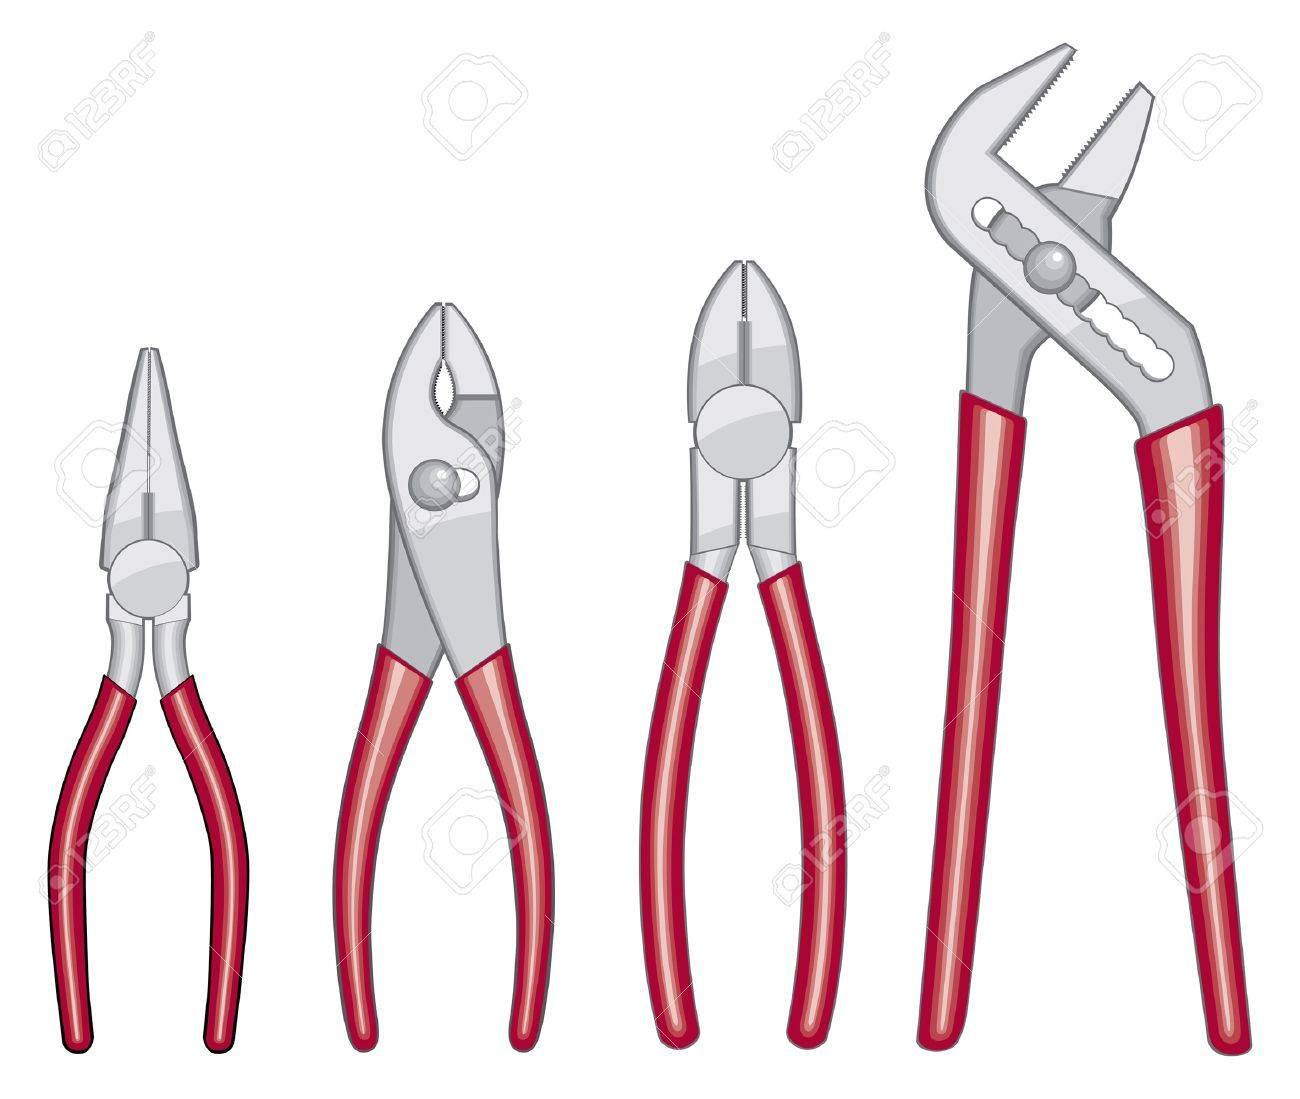 Pliers Types